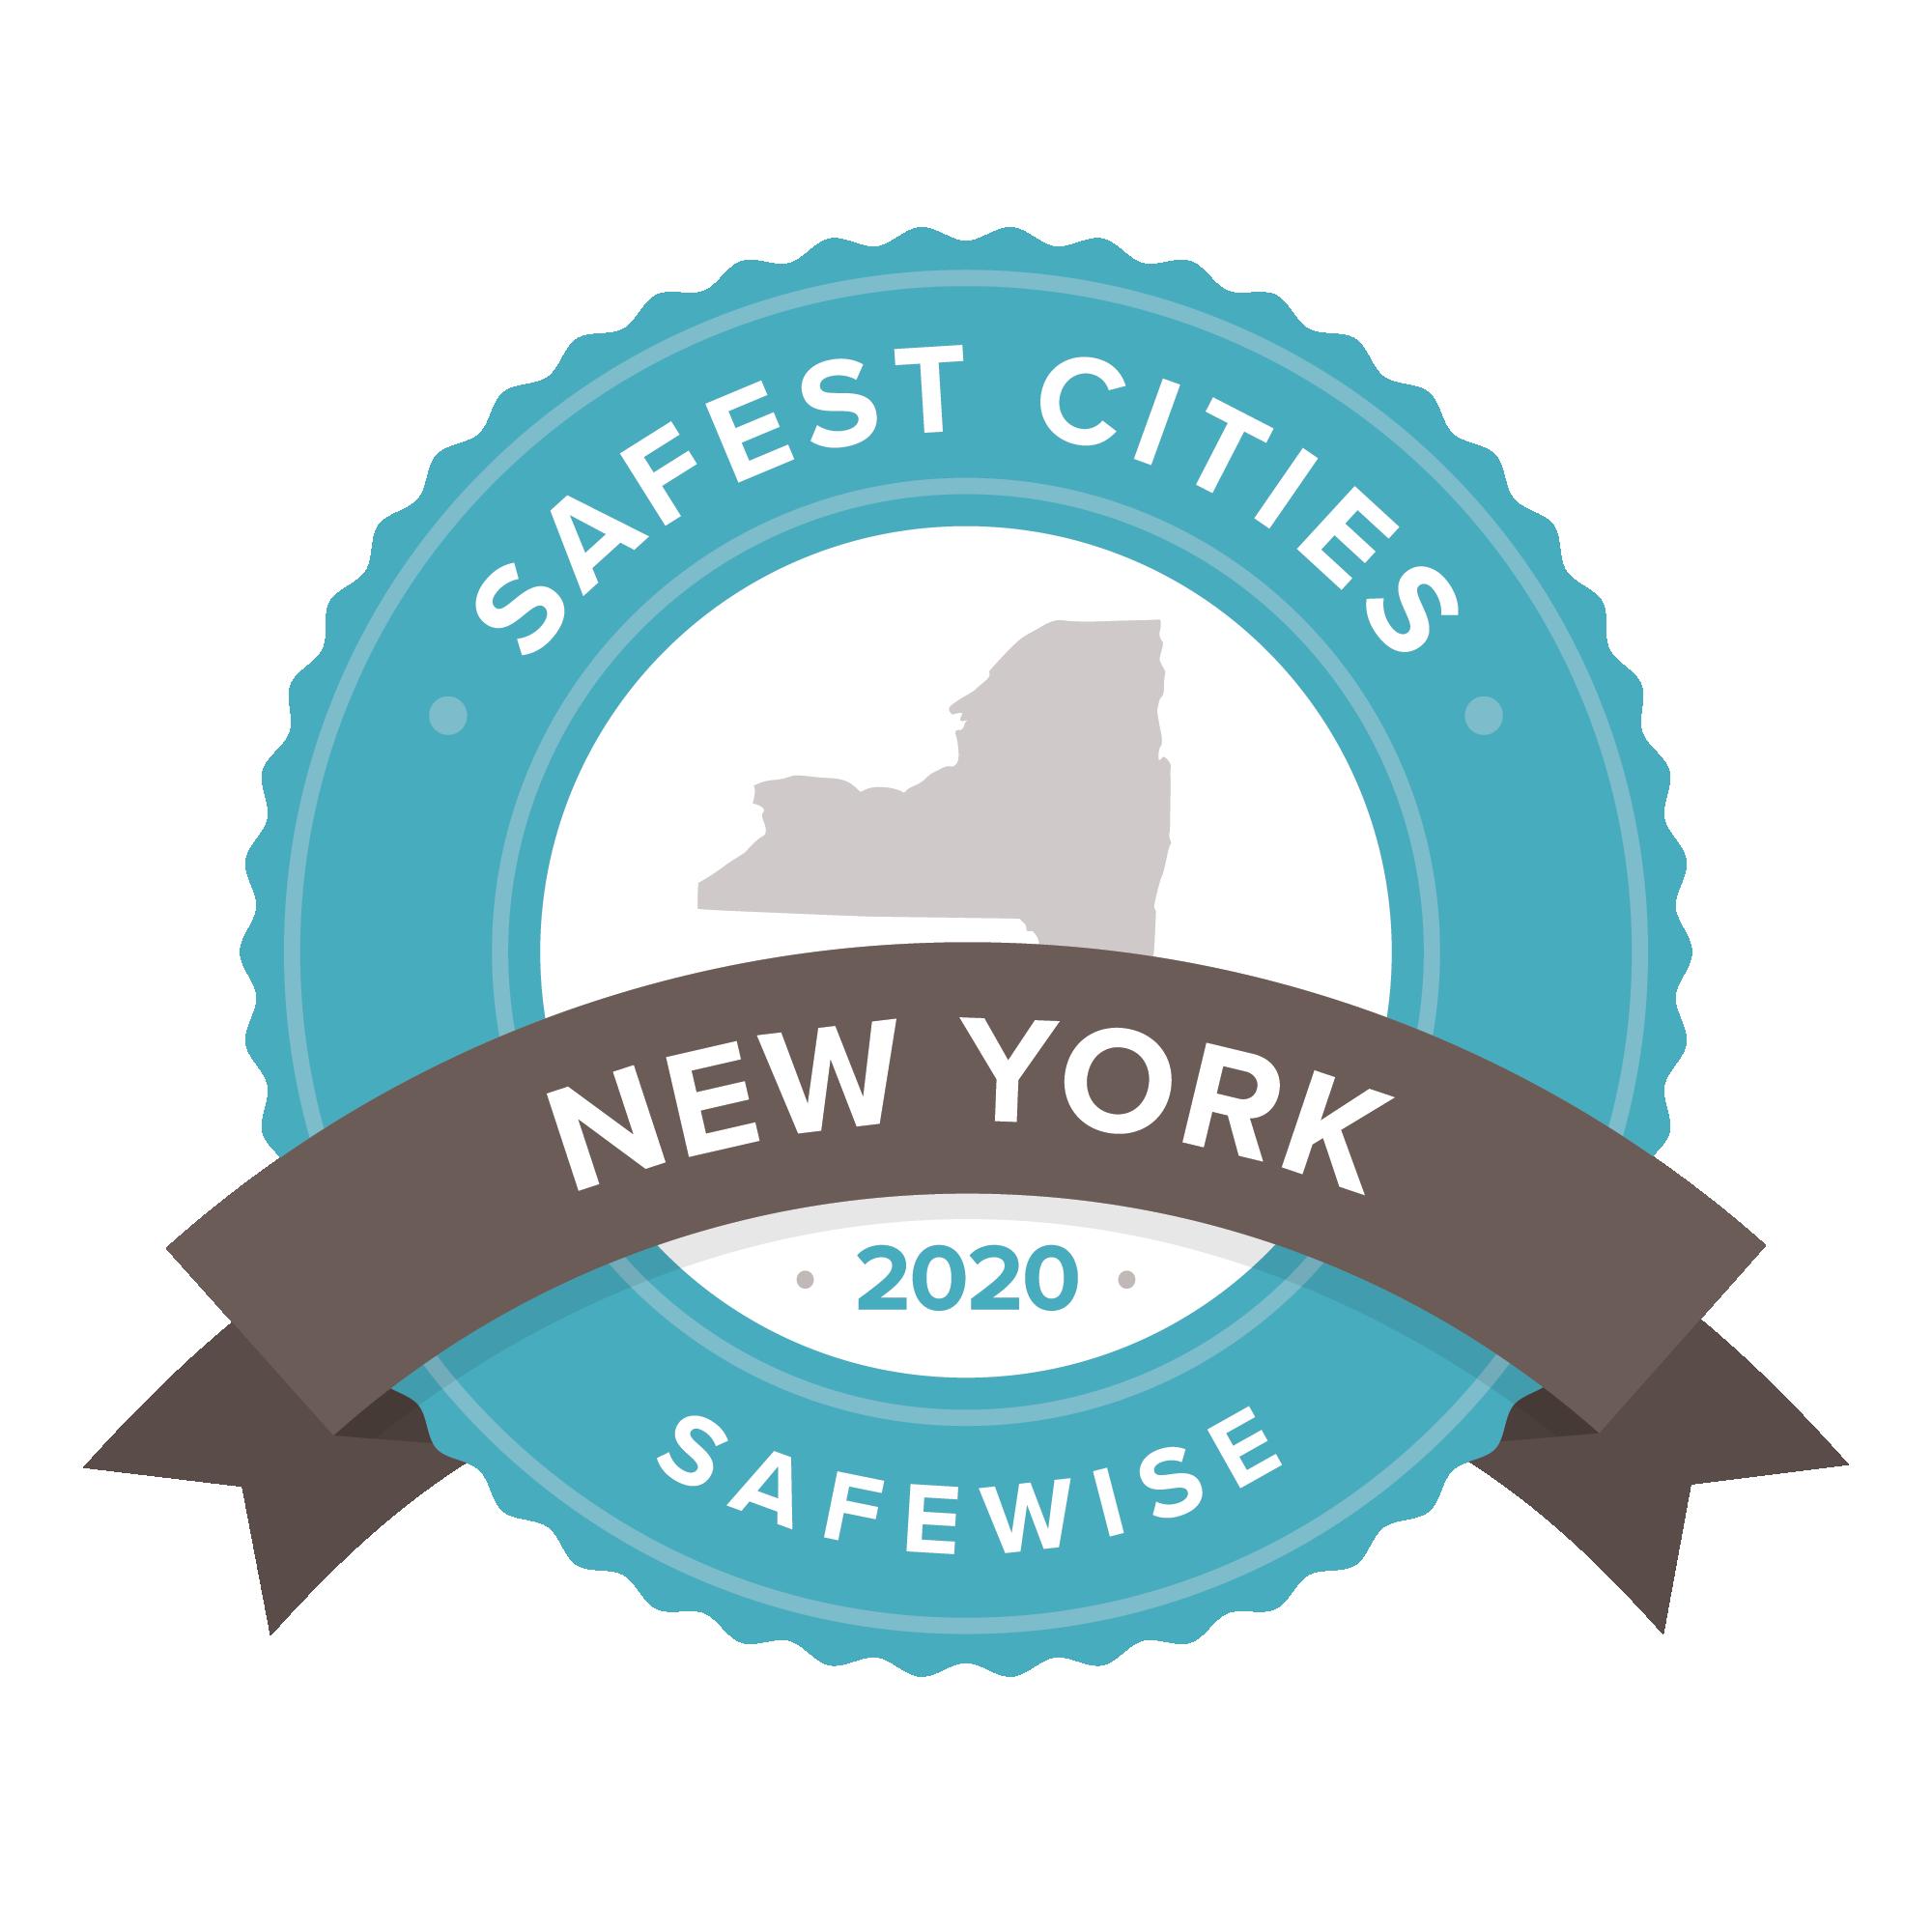 New York safest cities badge